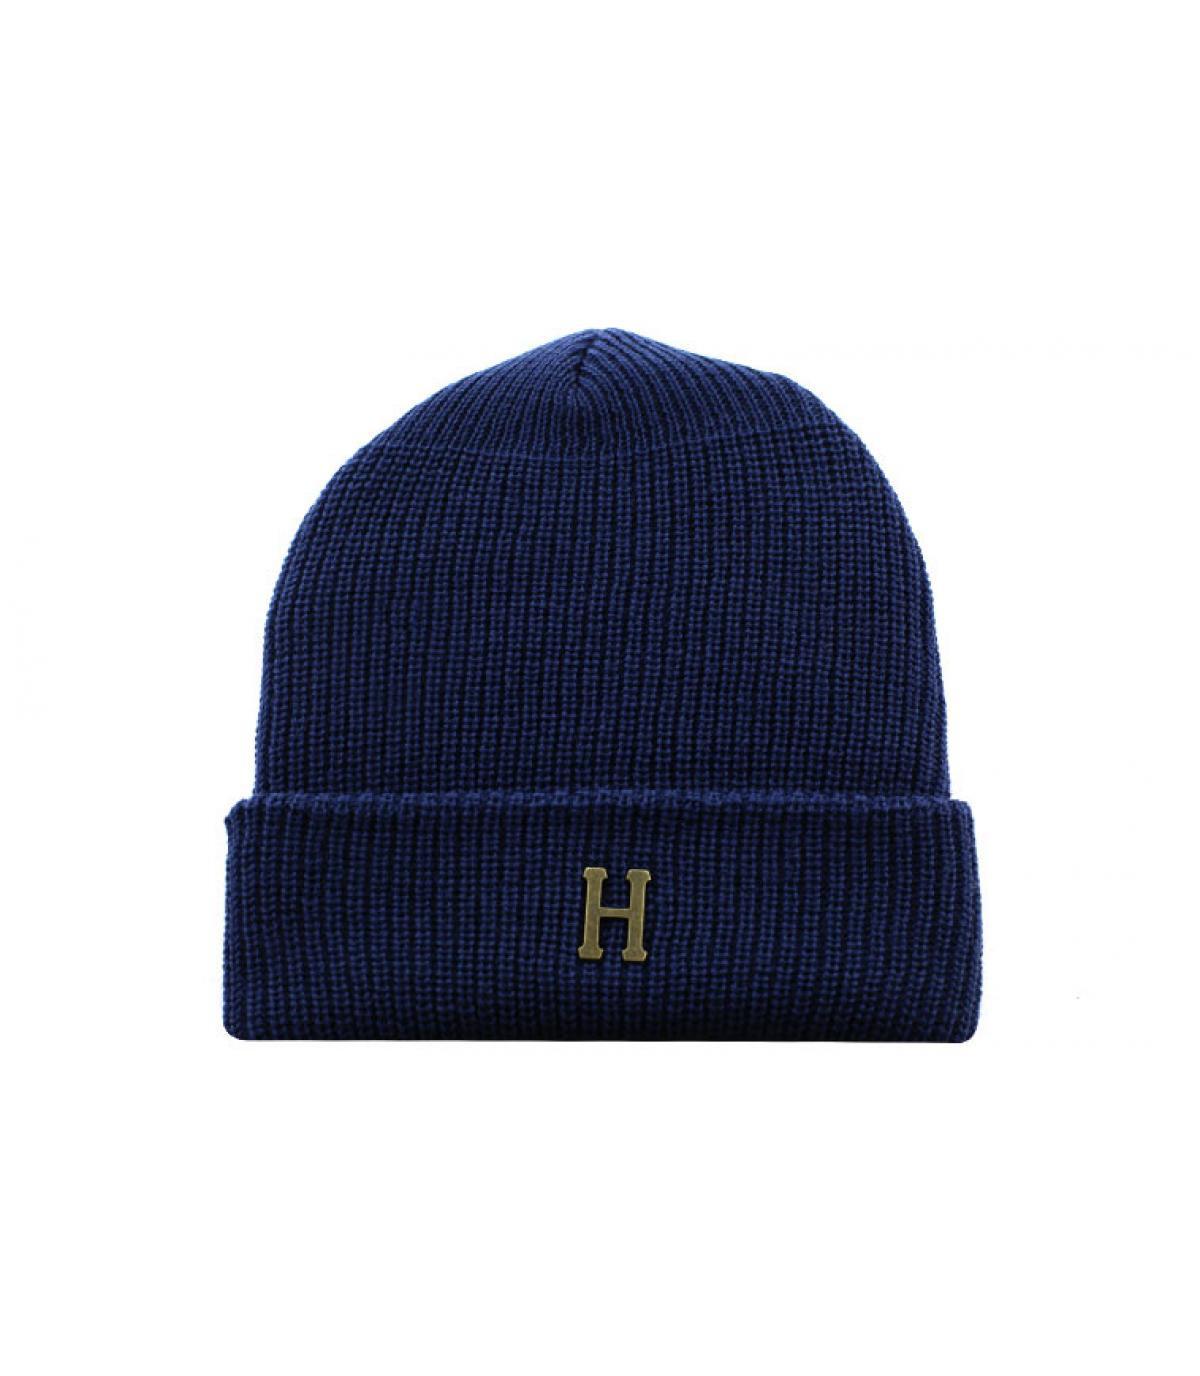 Huf blue H beanie - Brass H Military Beanie navy by Huf. Headict 2b80b2635241